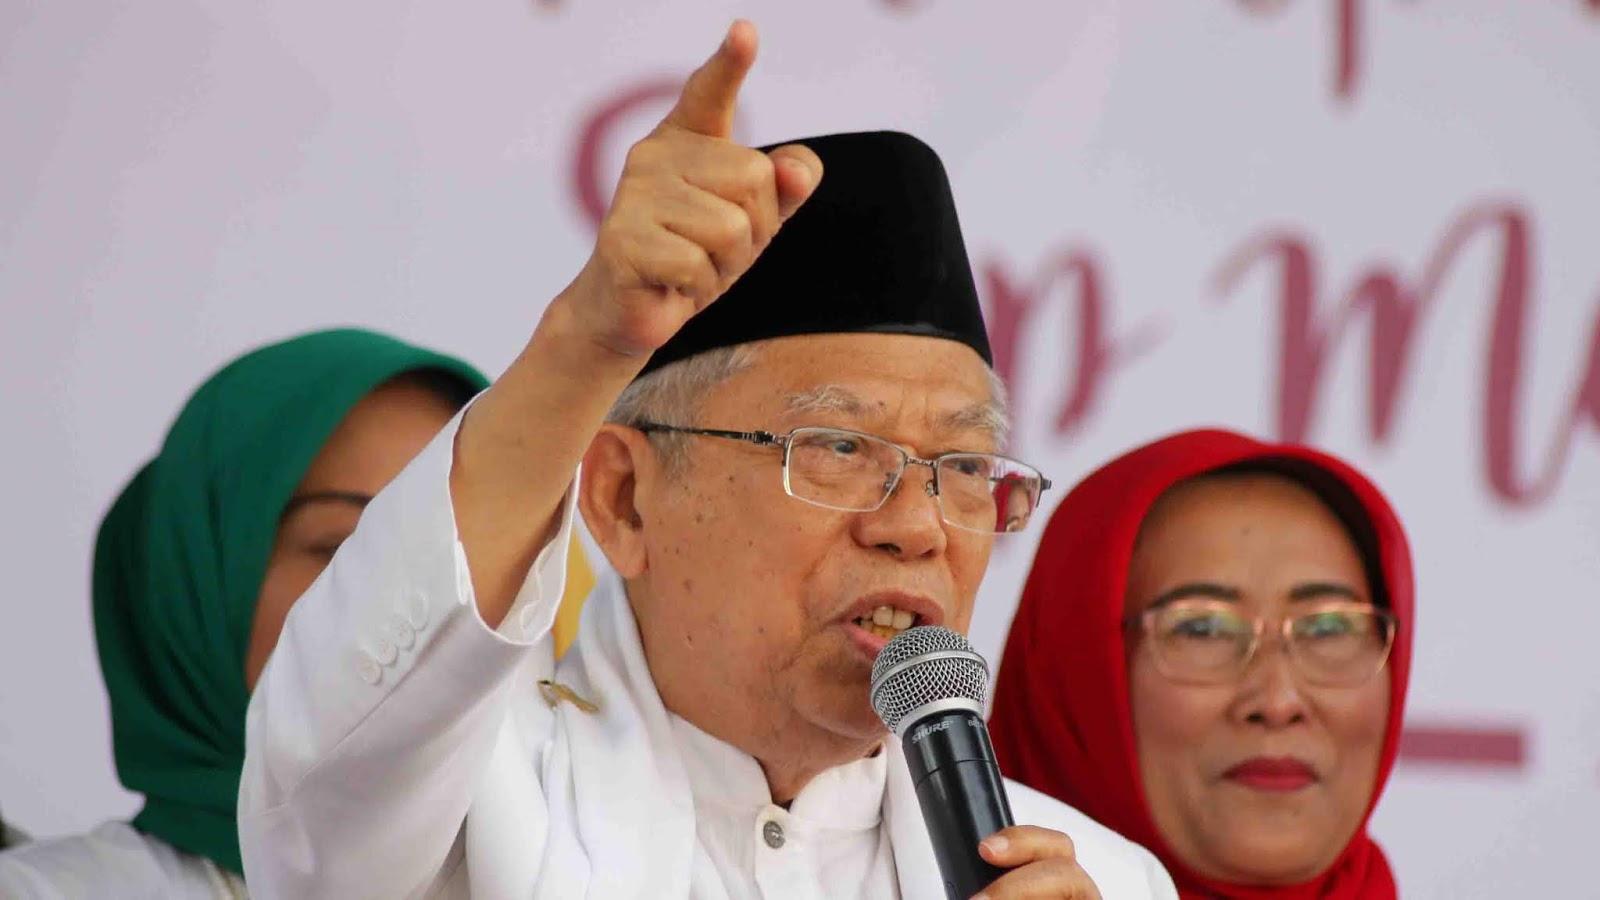 Mengejutkan, Ini Bantahan Ma'ruf Amin Soal Jokowi Kader PKI